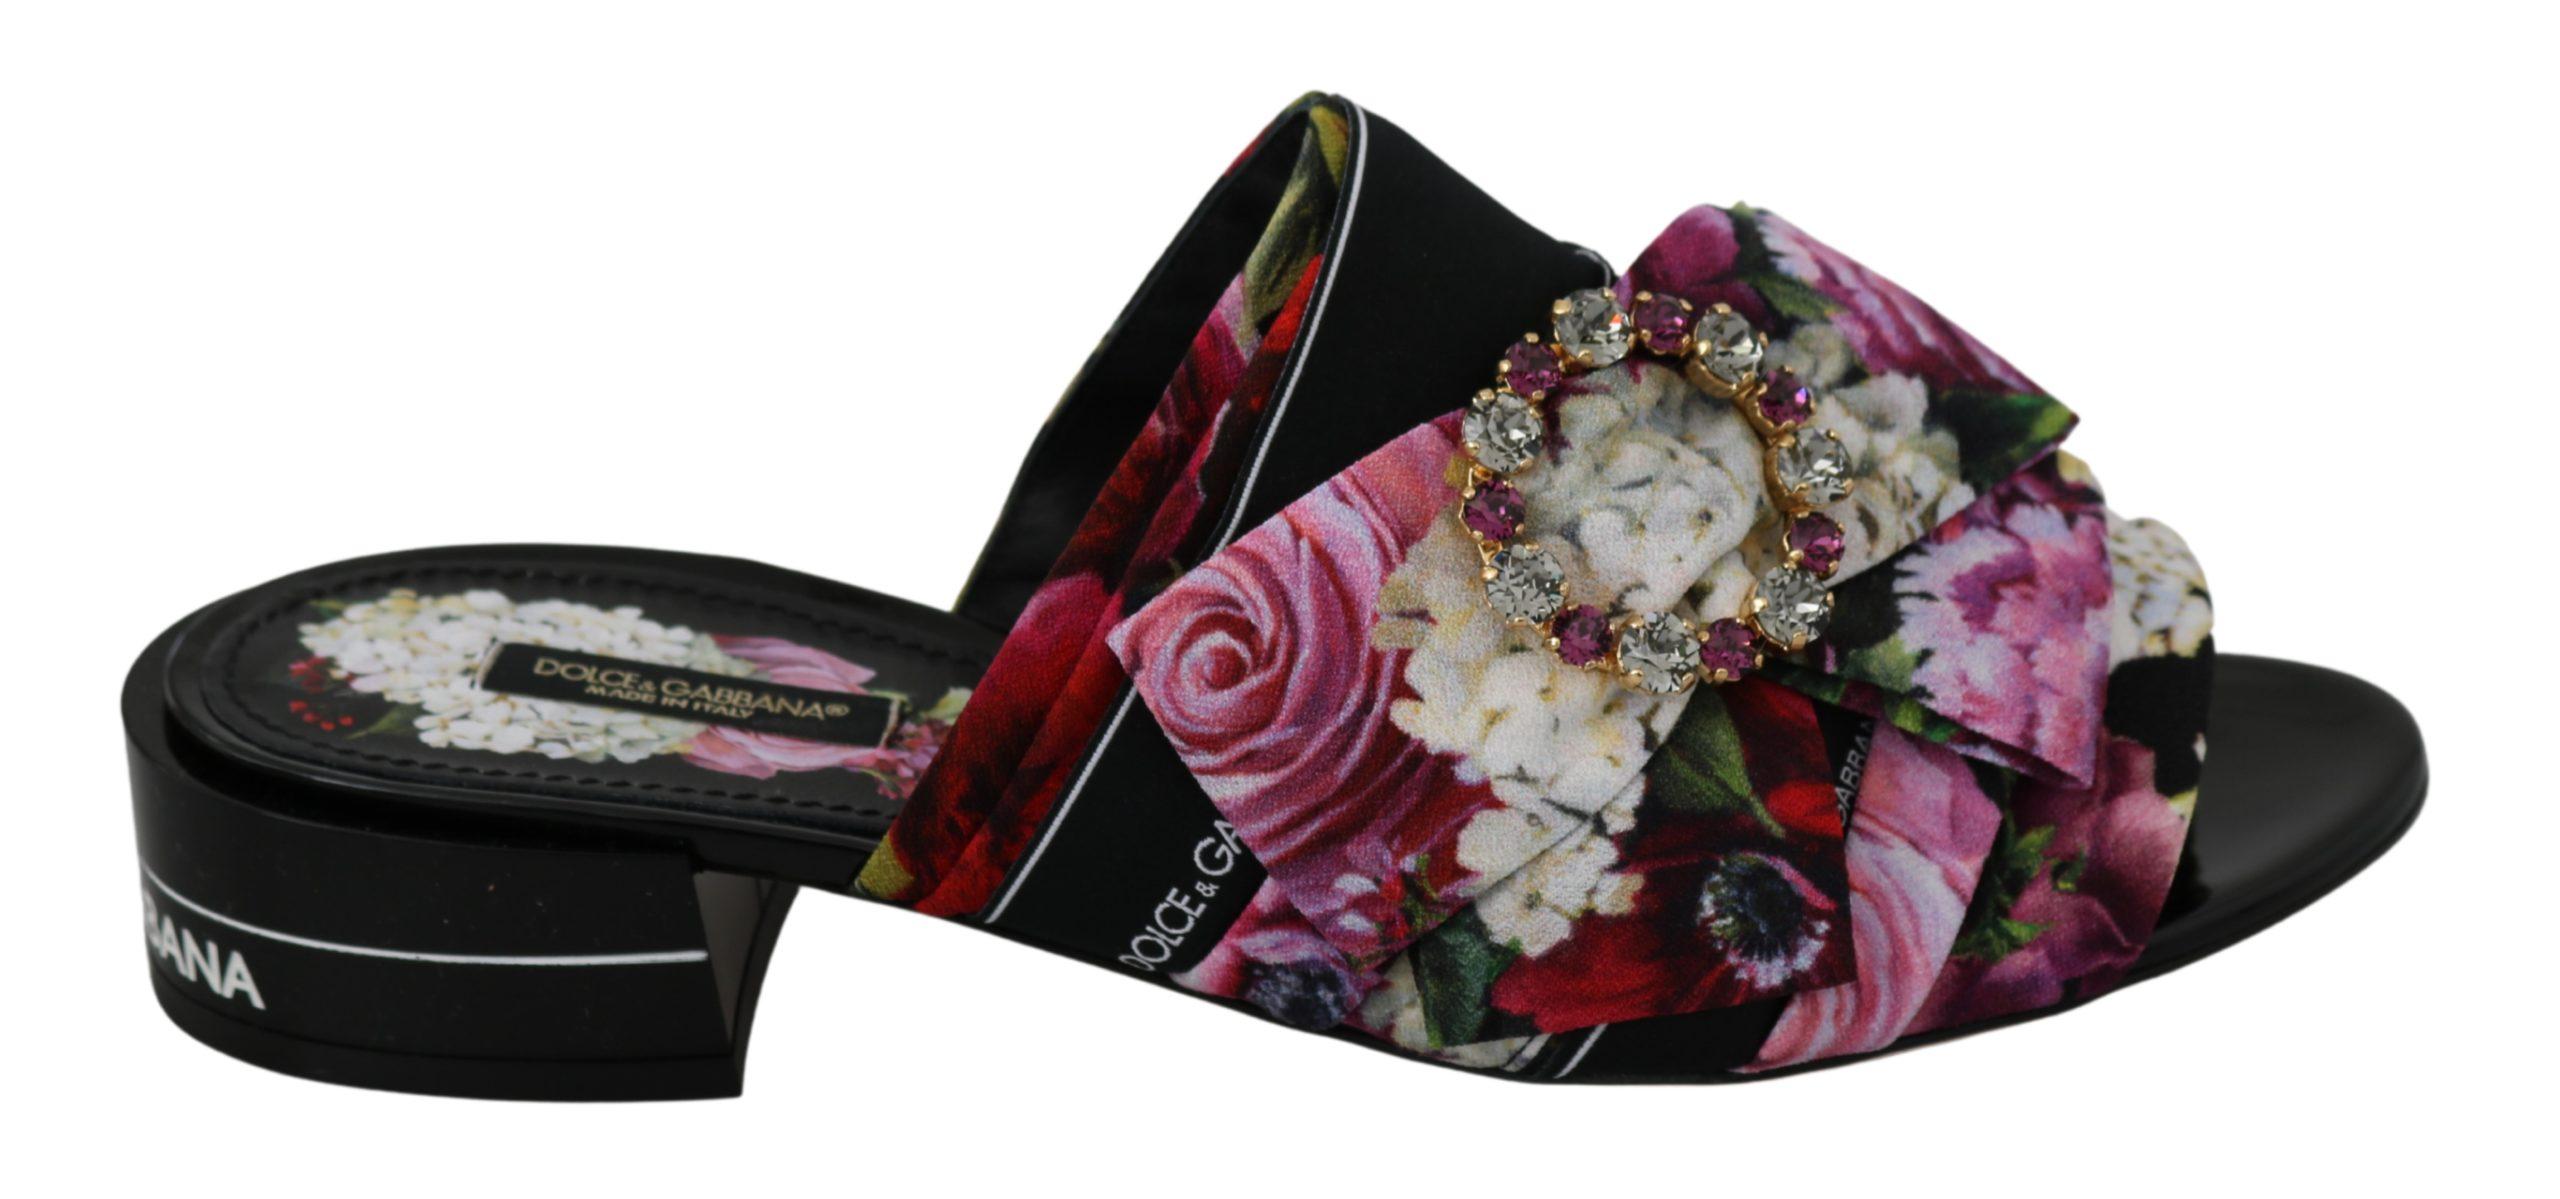 Dolce & Gabbana Women's Floral Crystal Sandals Black LA6567 - EU35.5/US5